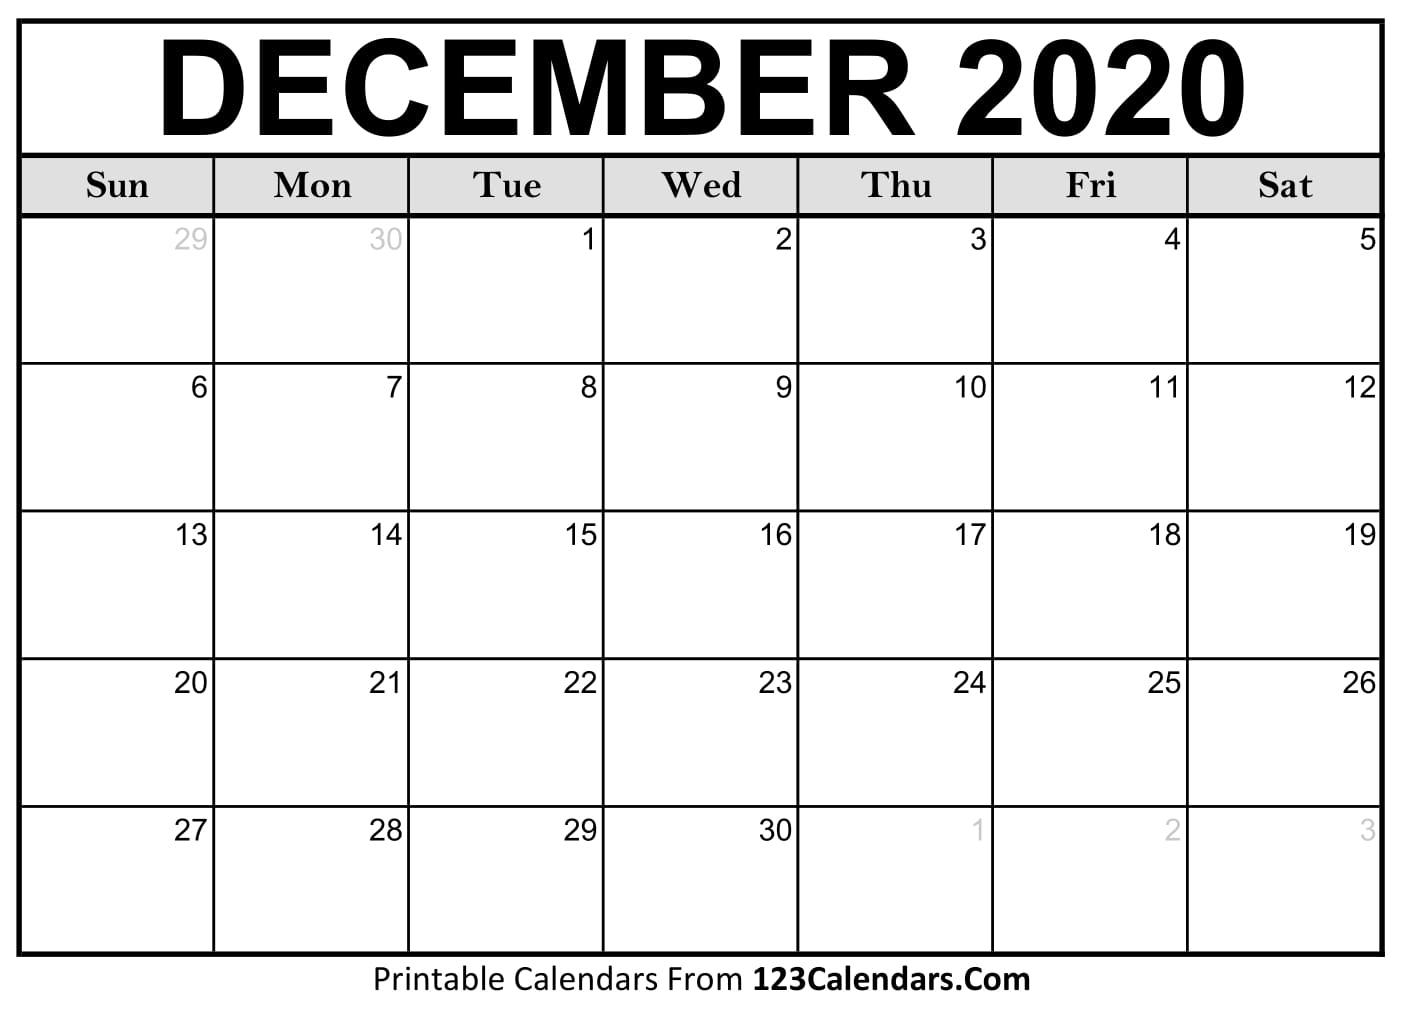 December 2020 Printable Calendar | 123Calendars